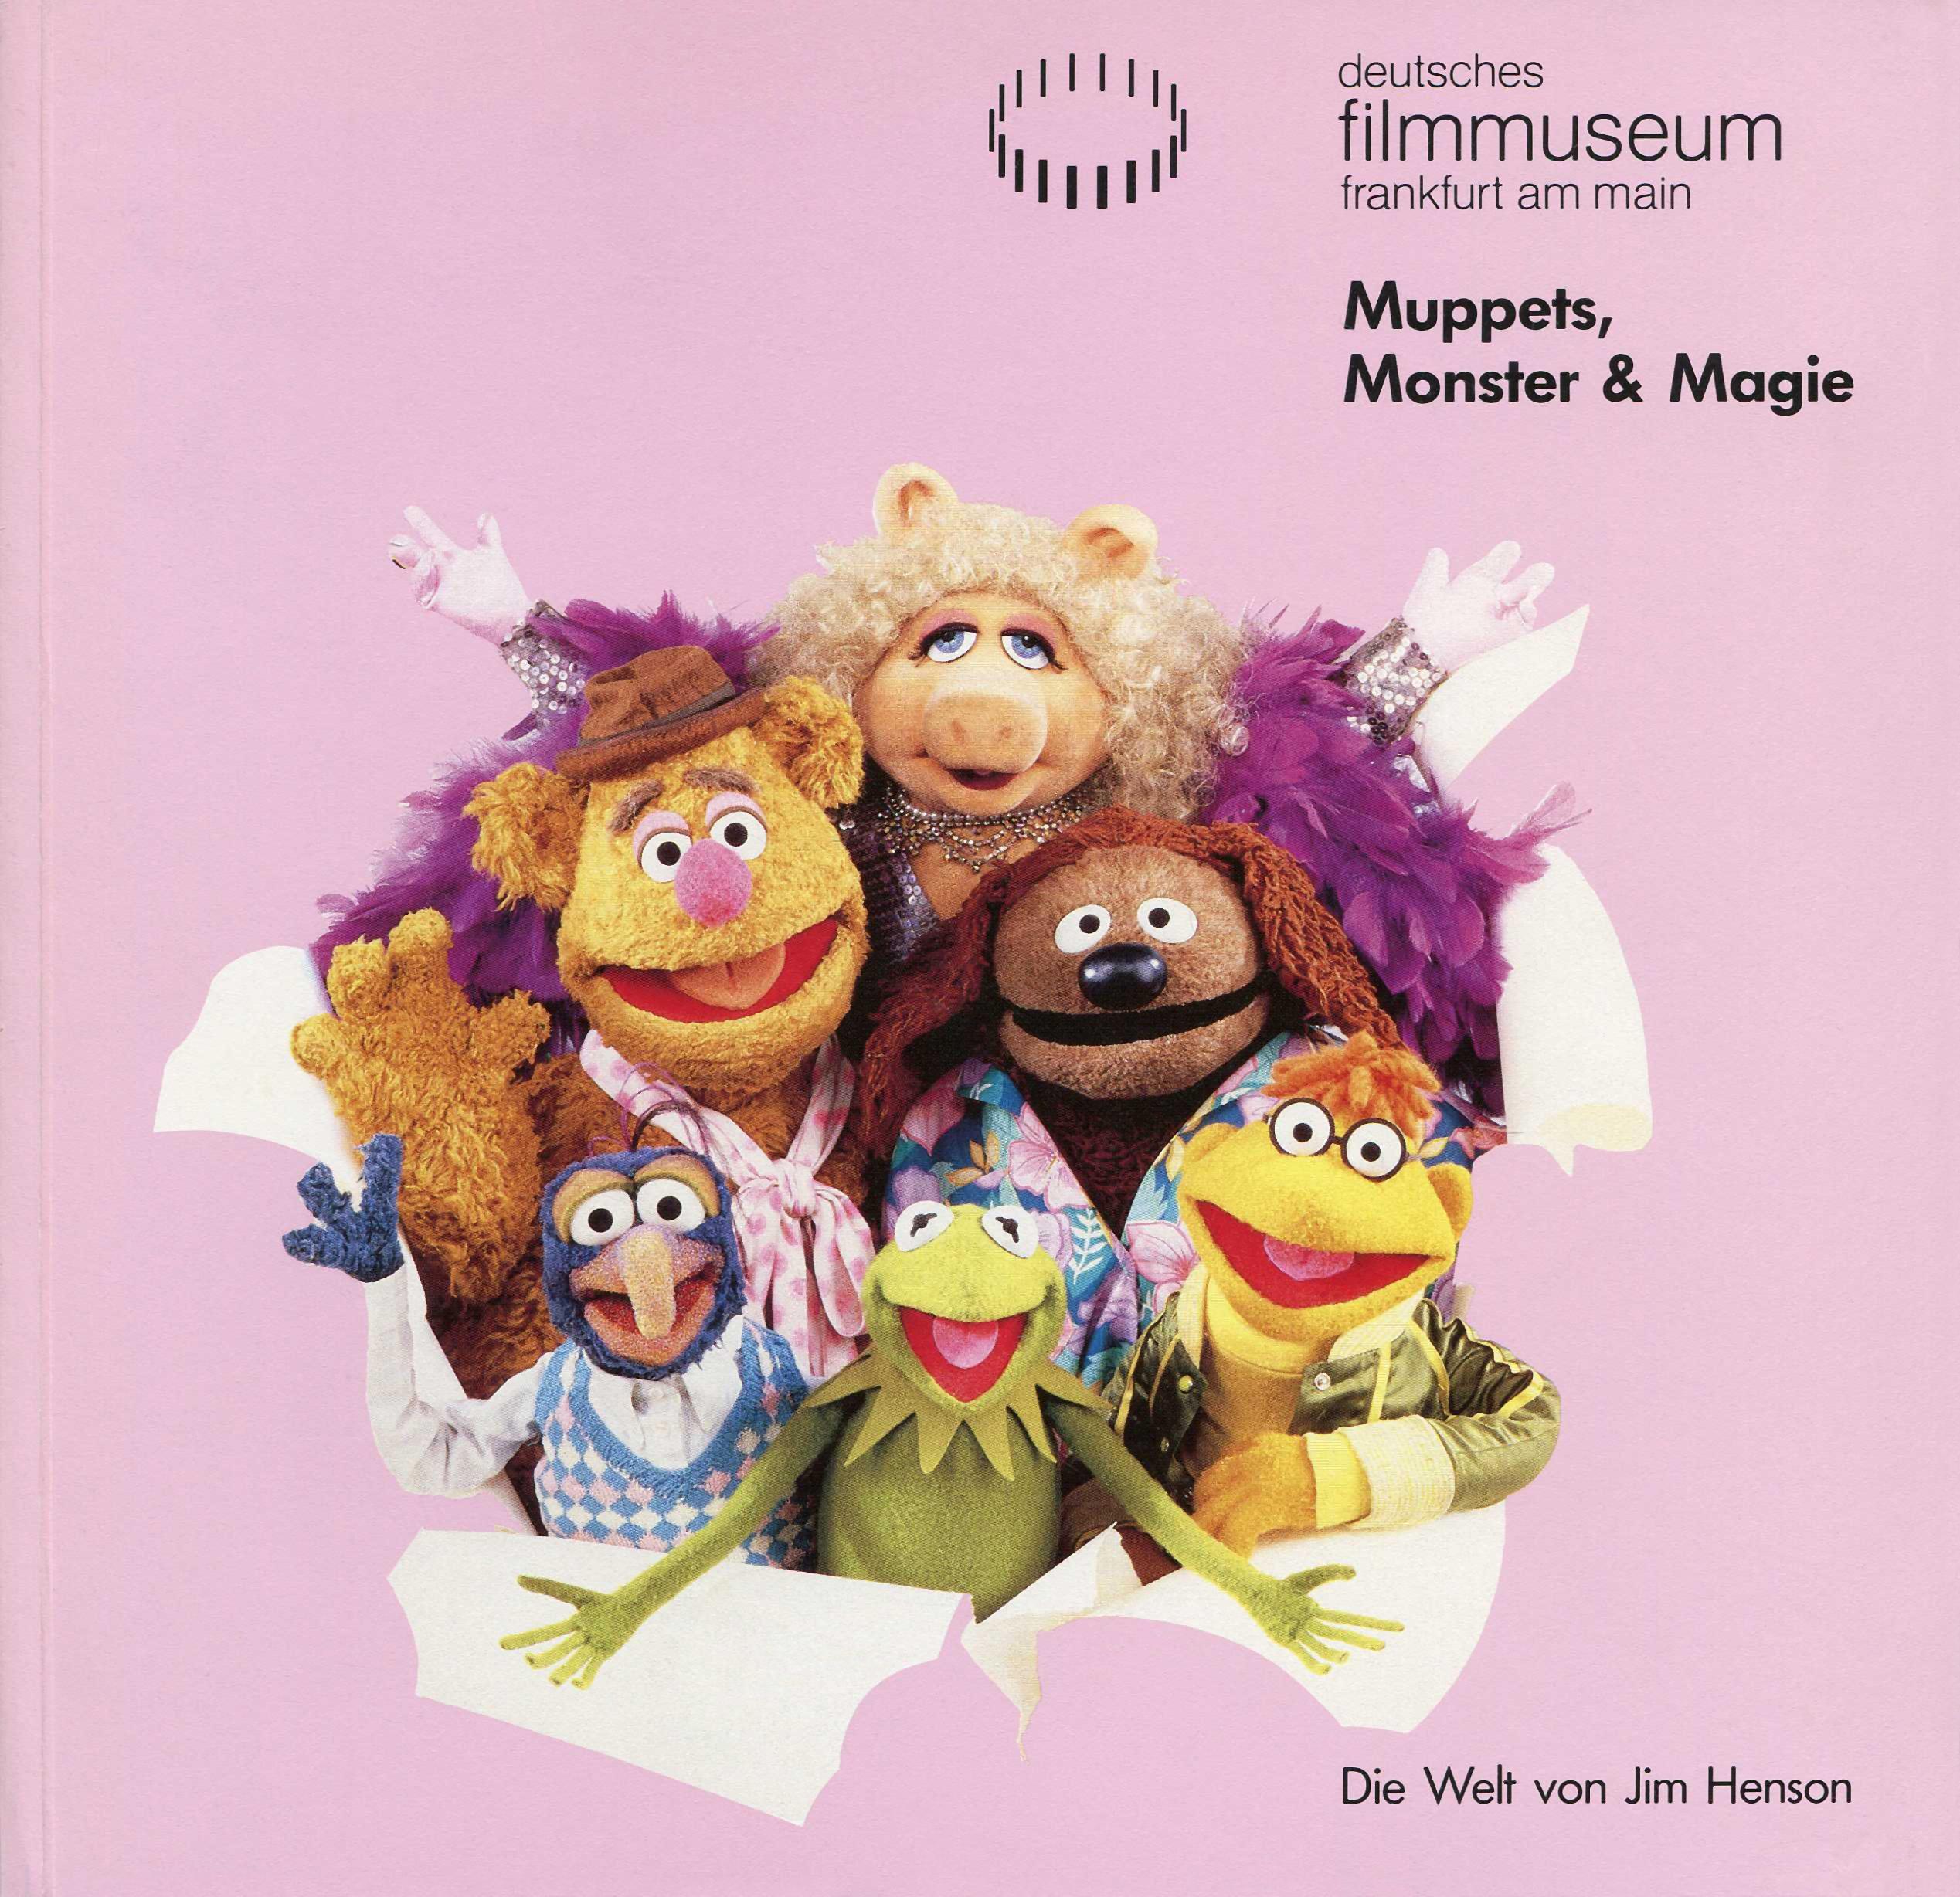 File:Muppetsmonsterandmagie.jpg